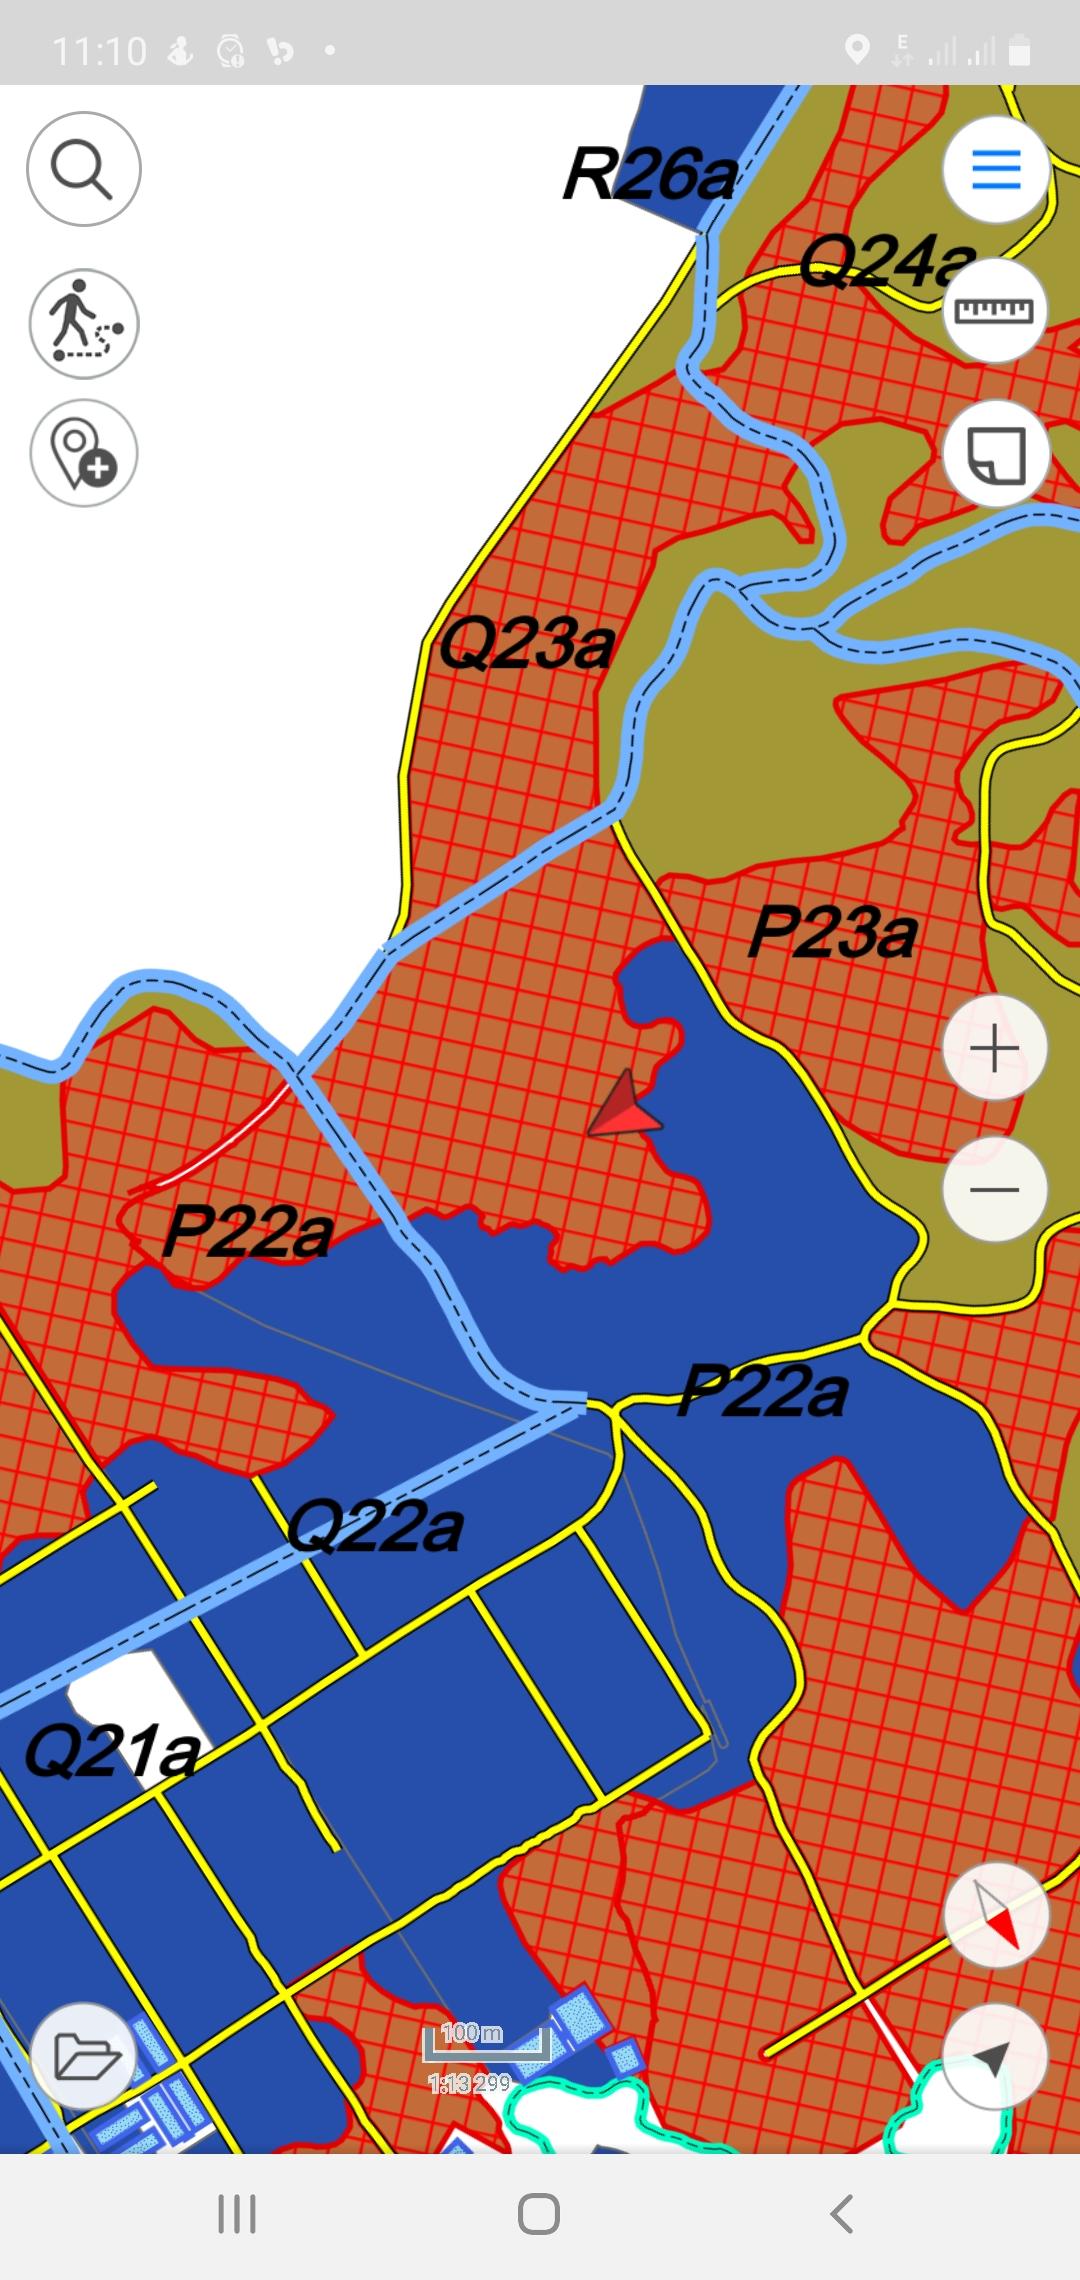 Peta Surprise Quality Check Area Controller 1 - SMRE Divisi 02 Blok P22 - Kamis, 01 Oktober 2020